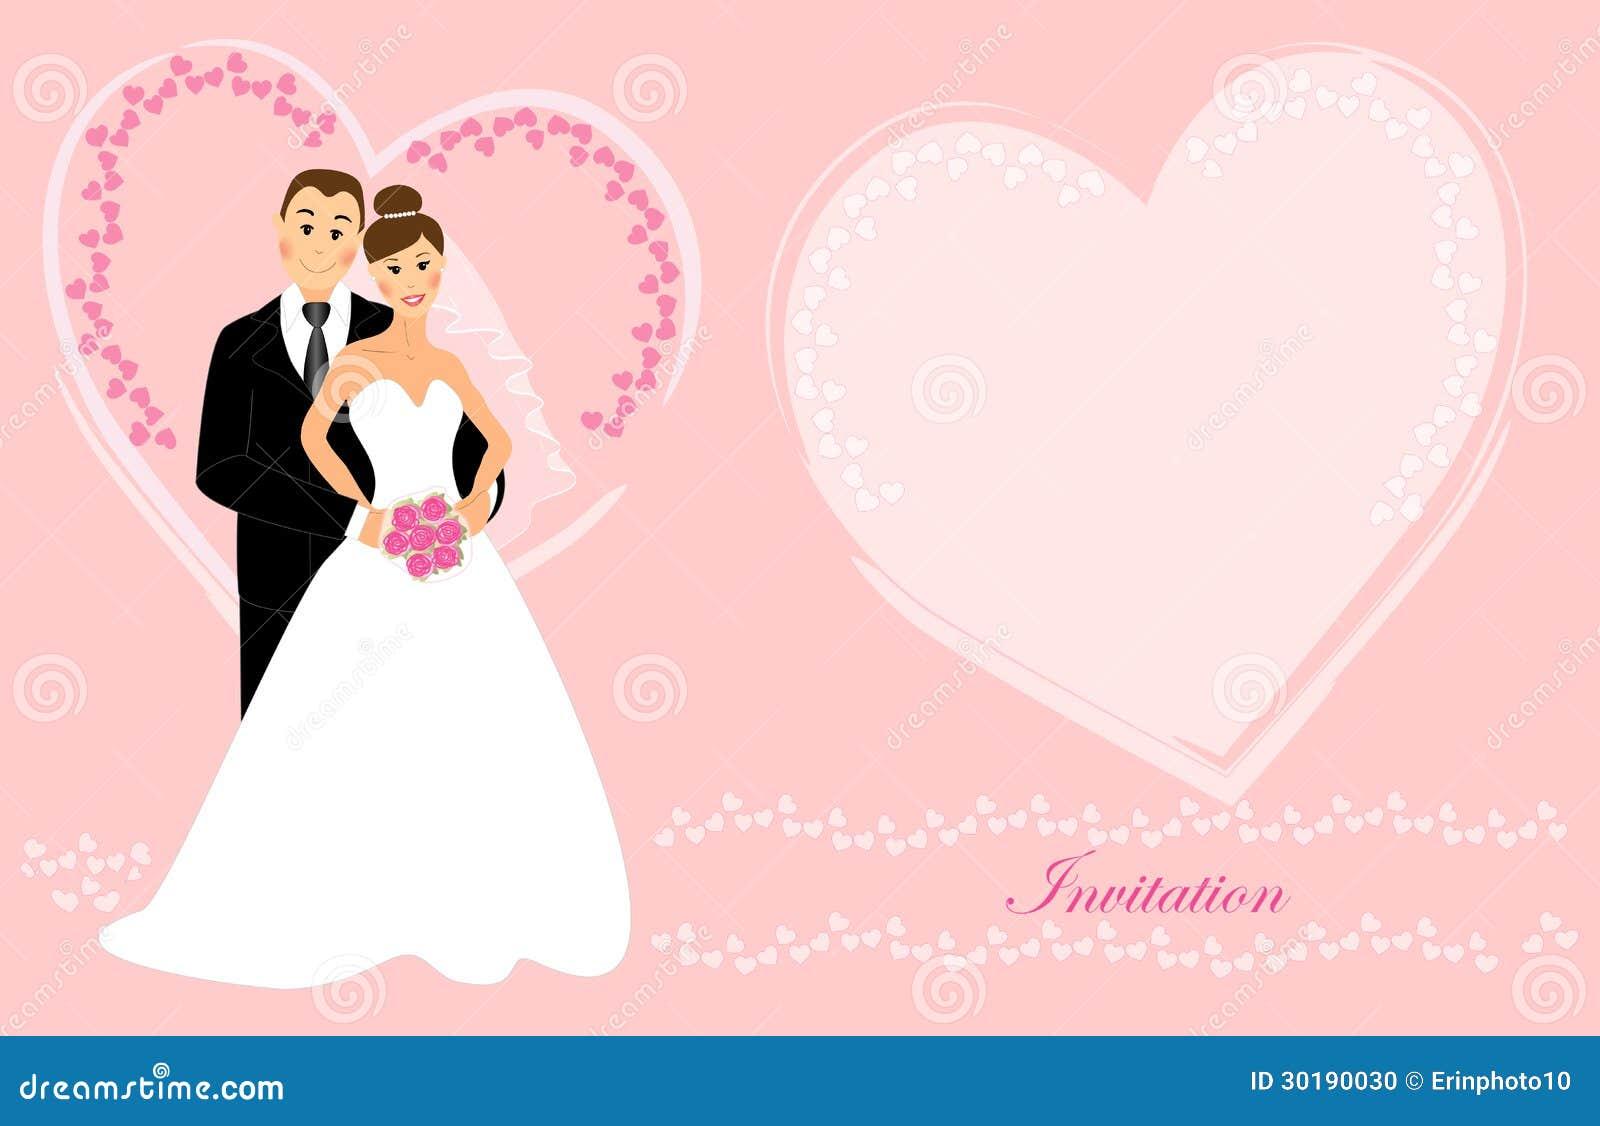 Wedding Boarding Pass Invitations is perfect invitation layout